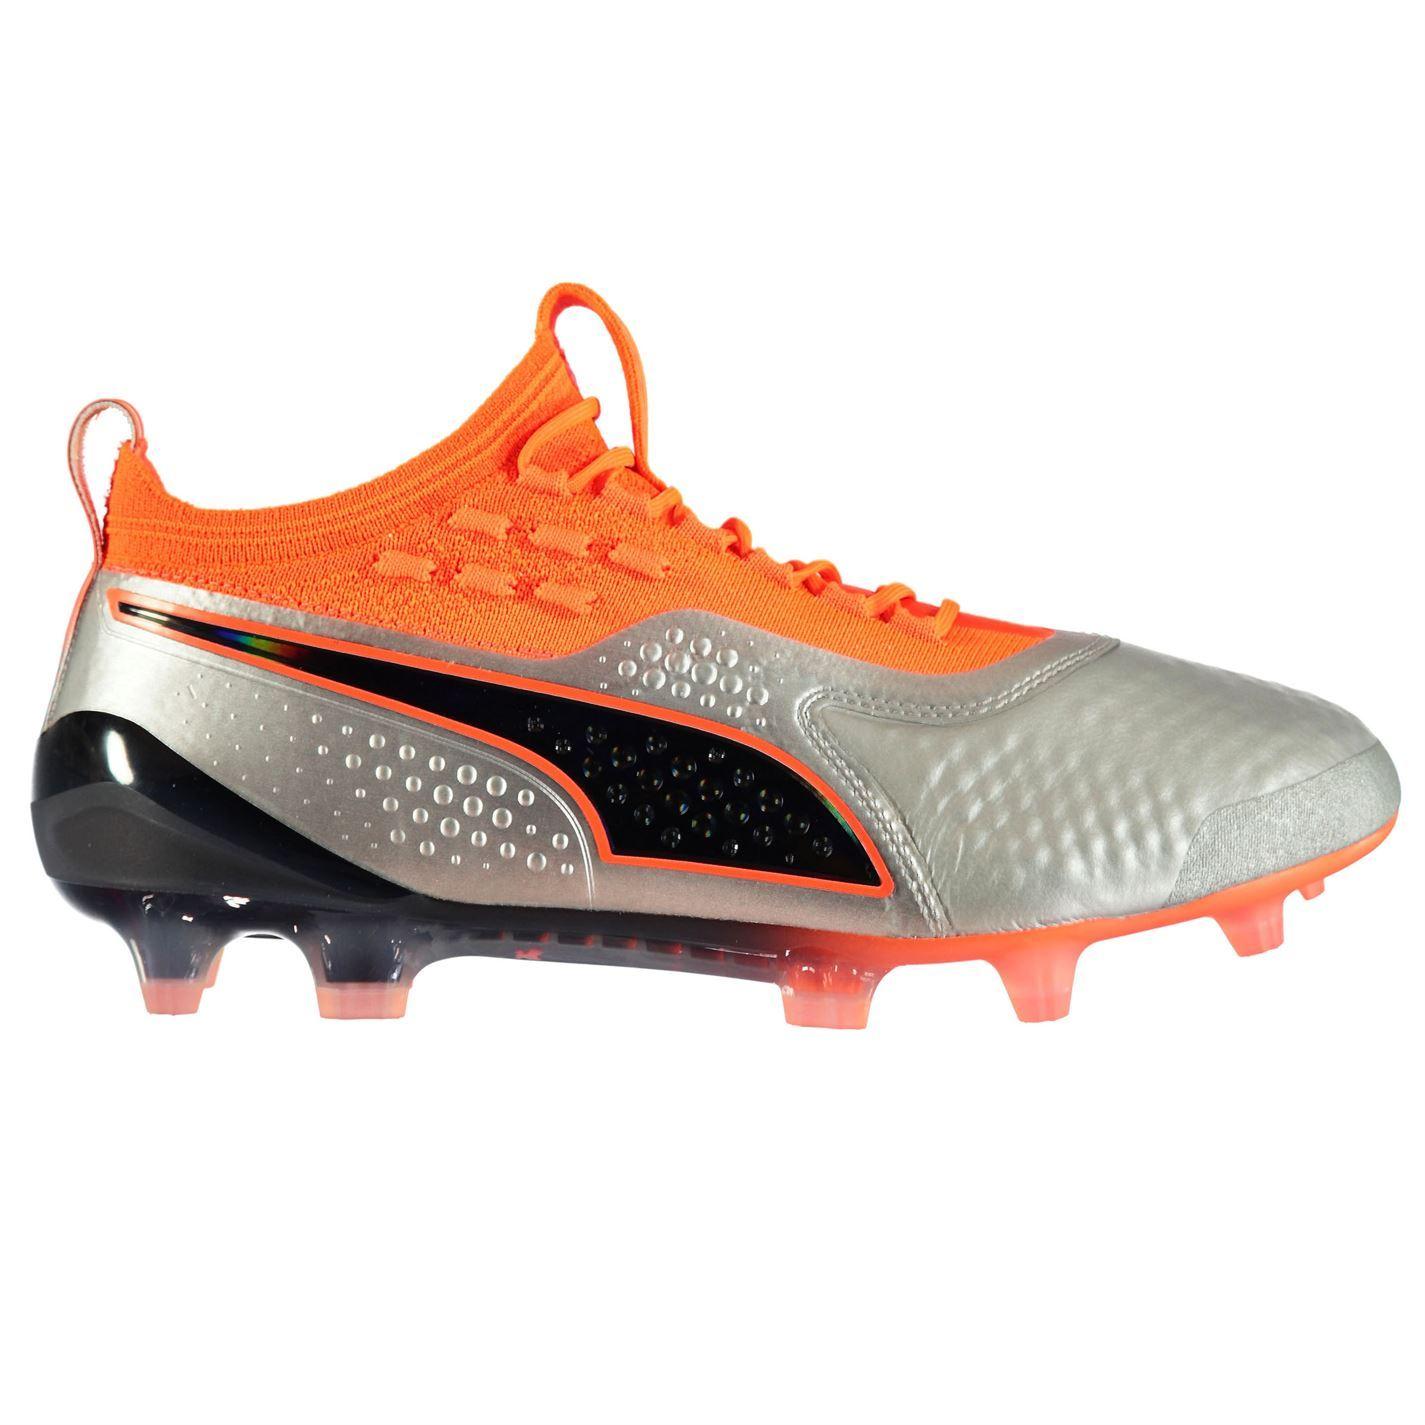 miniature 5 - PUMA 1 Fg Firm Ground Chaussures De Football Homme Football Chaussures Crampons